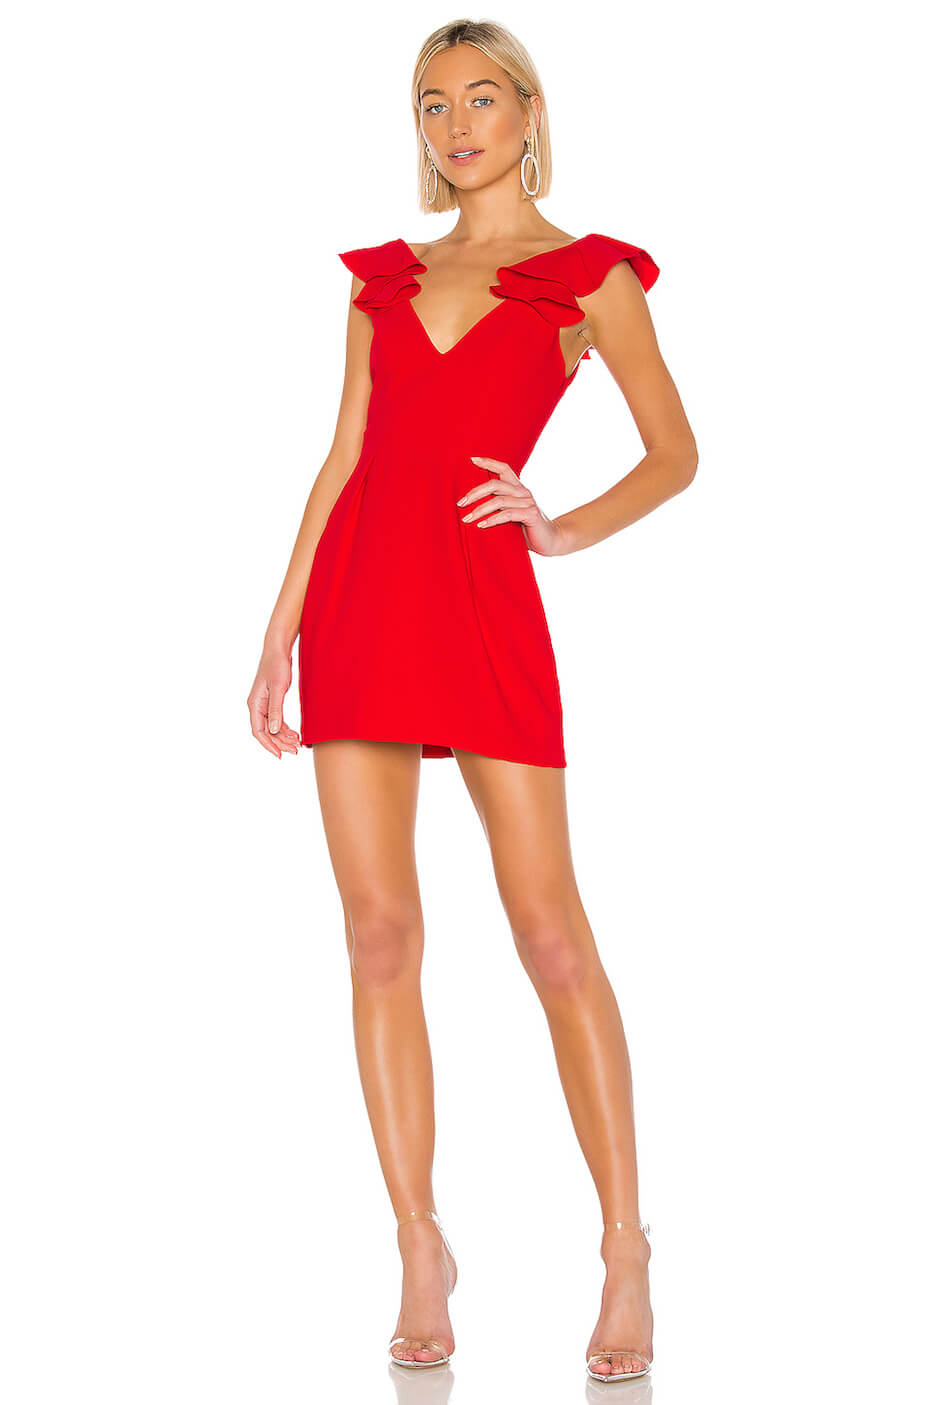 revolve-amanda-uprichard-gimlet-dress-021820